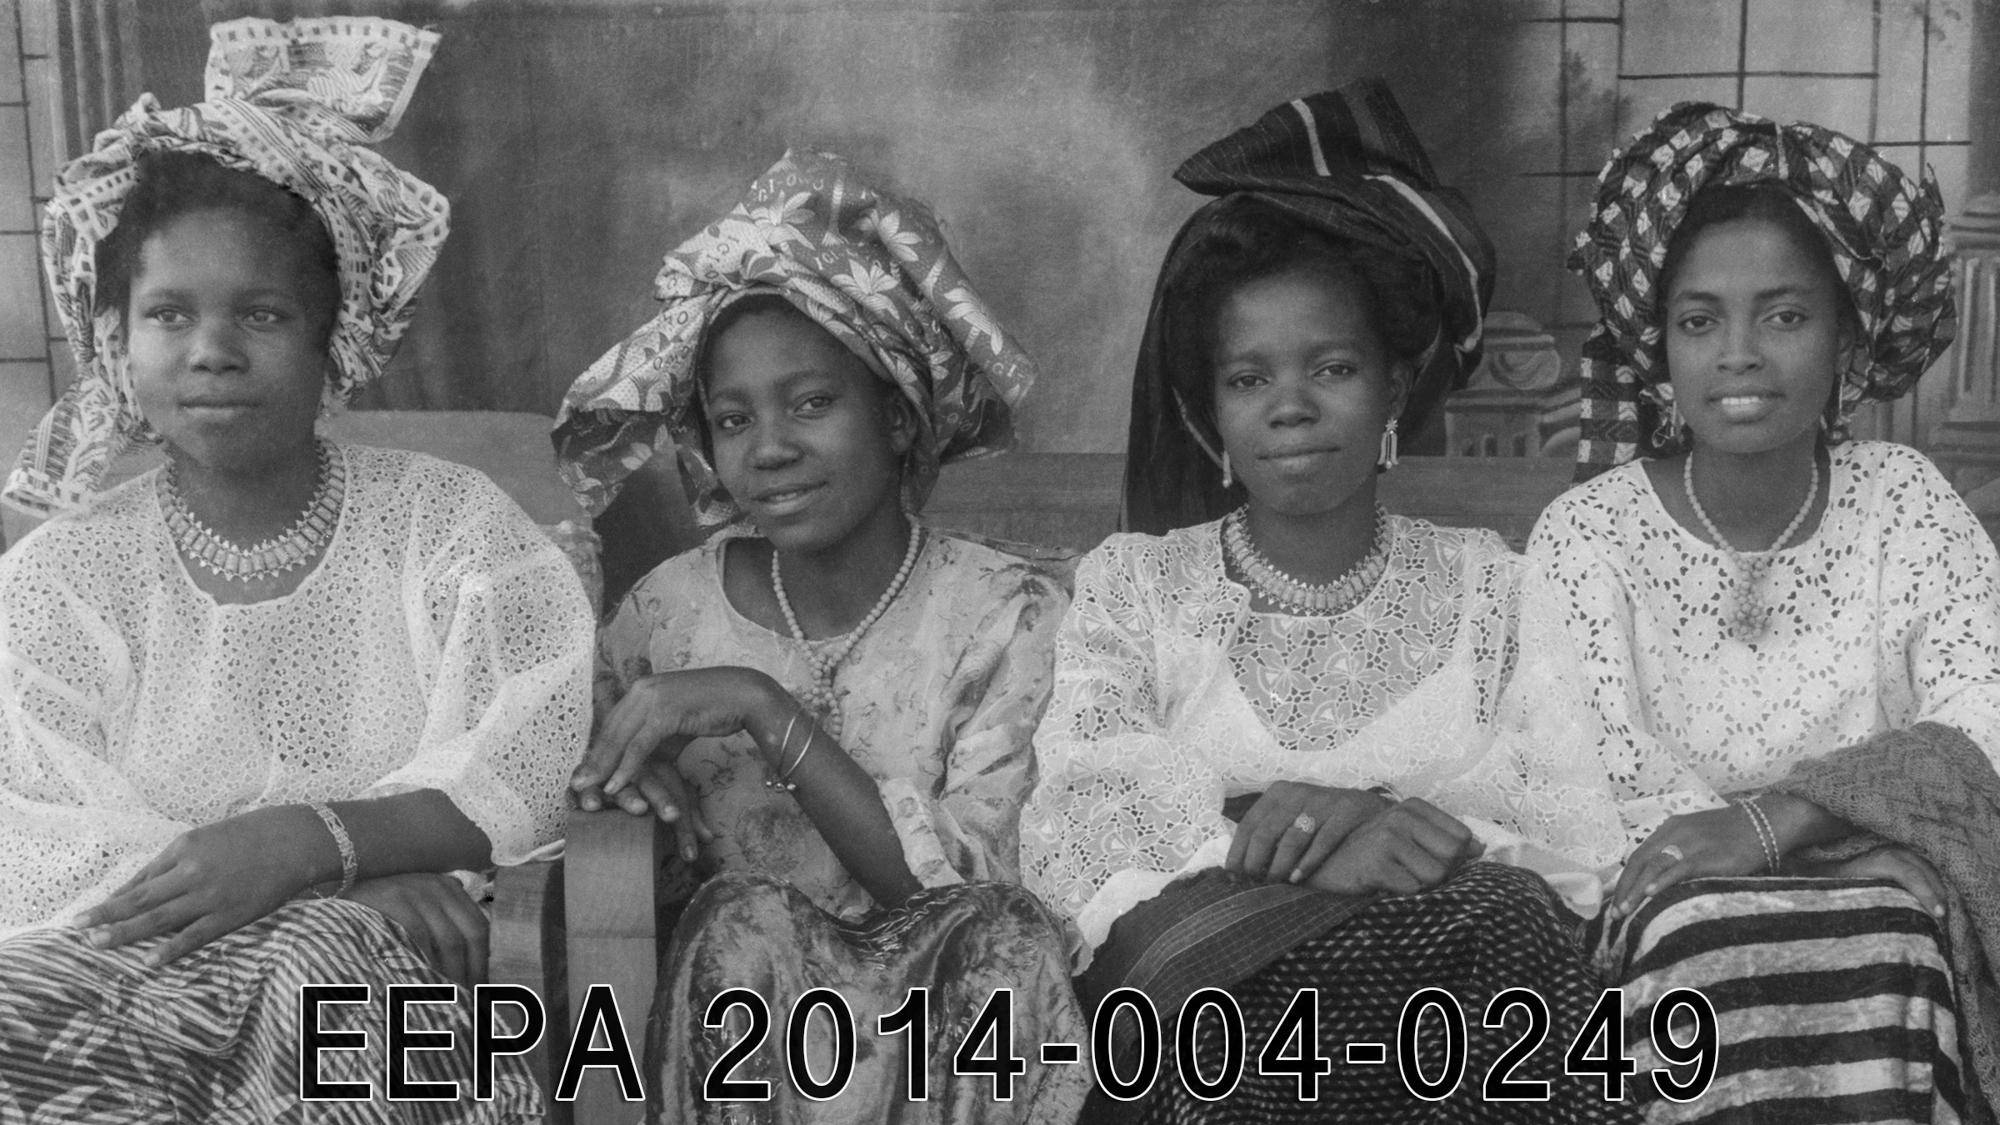 EEPA_2014-004-0249-M.jpg